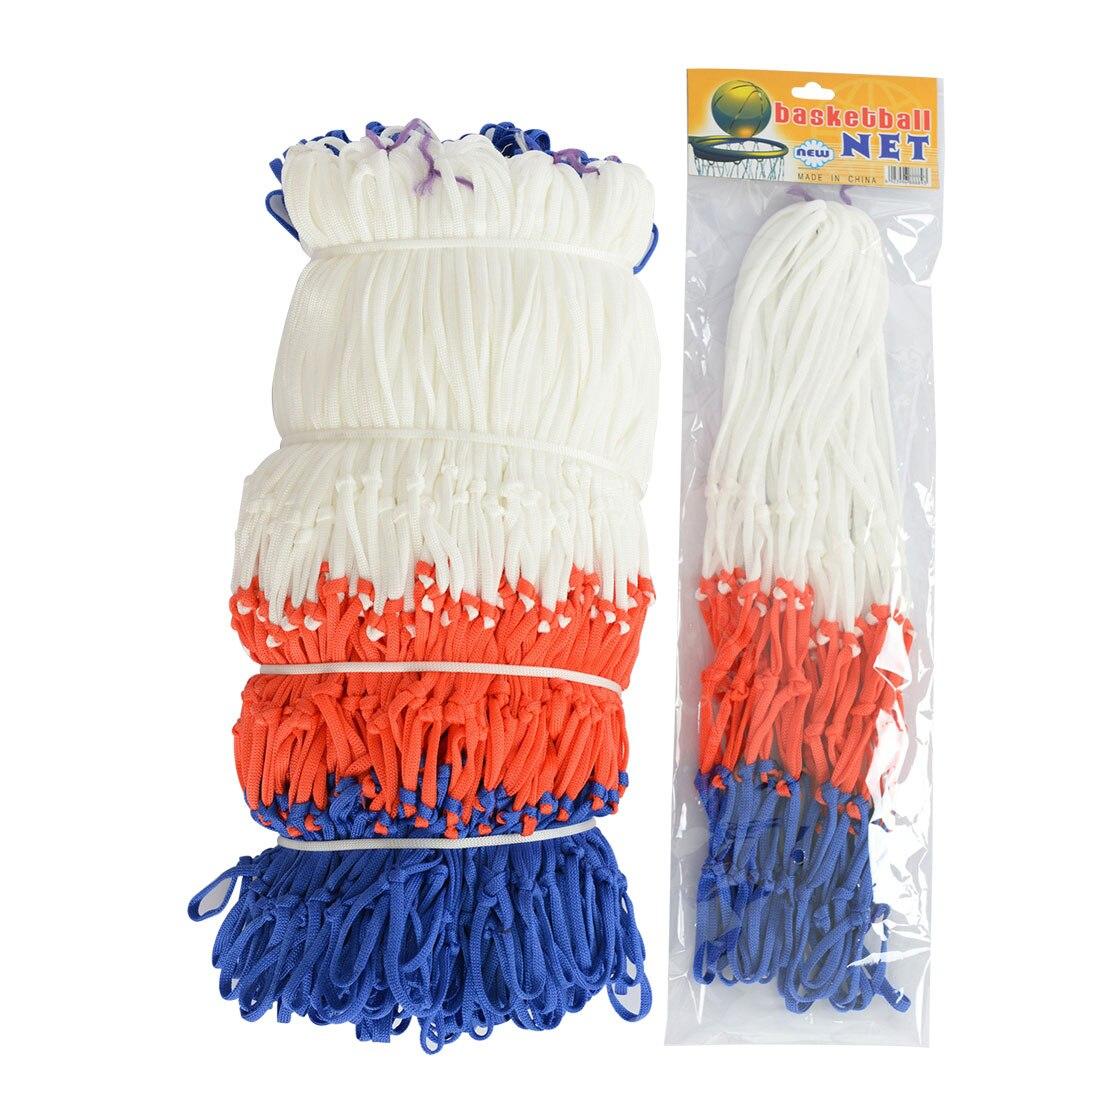 Standard Nylon Thread Sports Basketball Hoop Mesh Net Backboard Rim Ball Pump 12 Loops White Red Blue 3 Colors Net